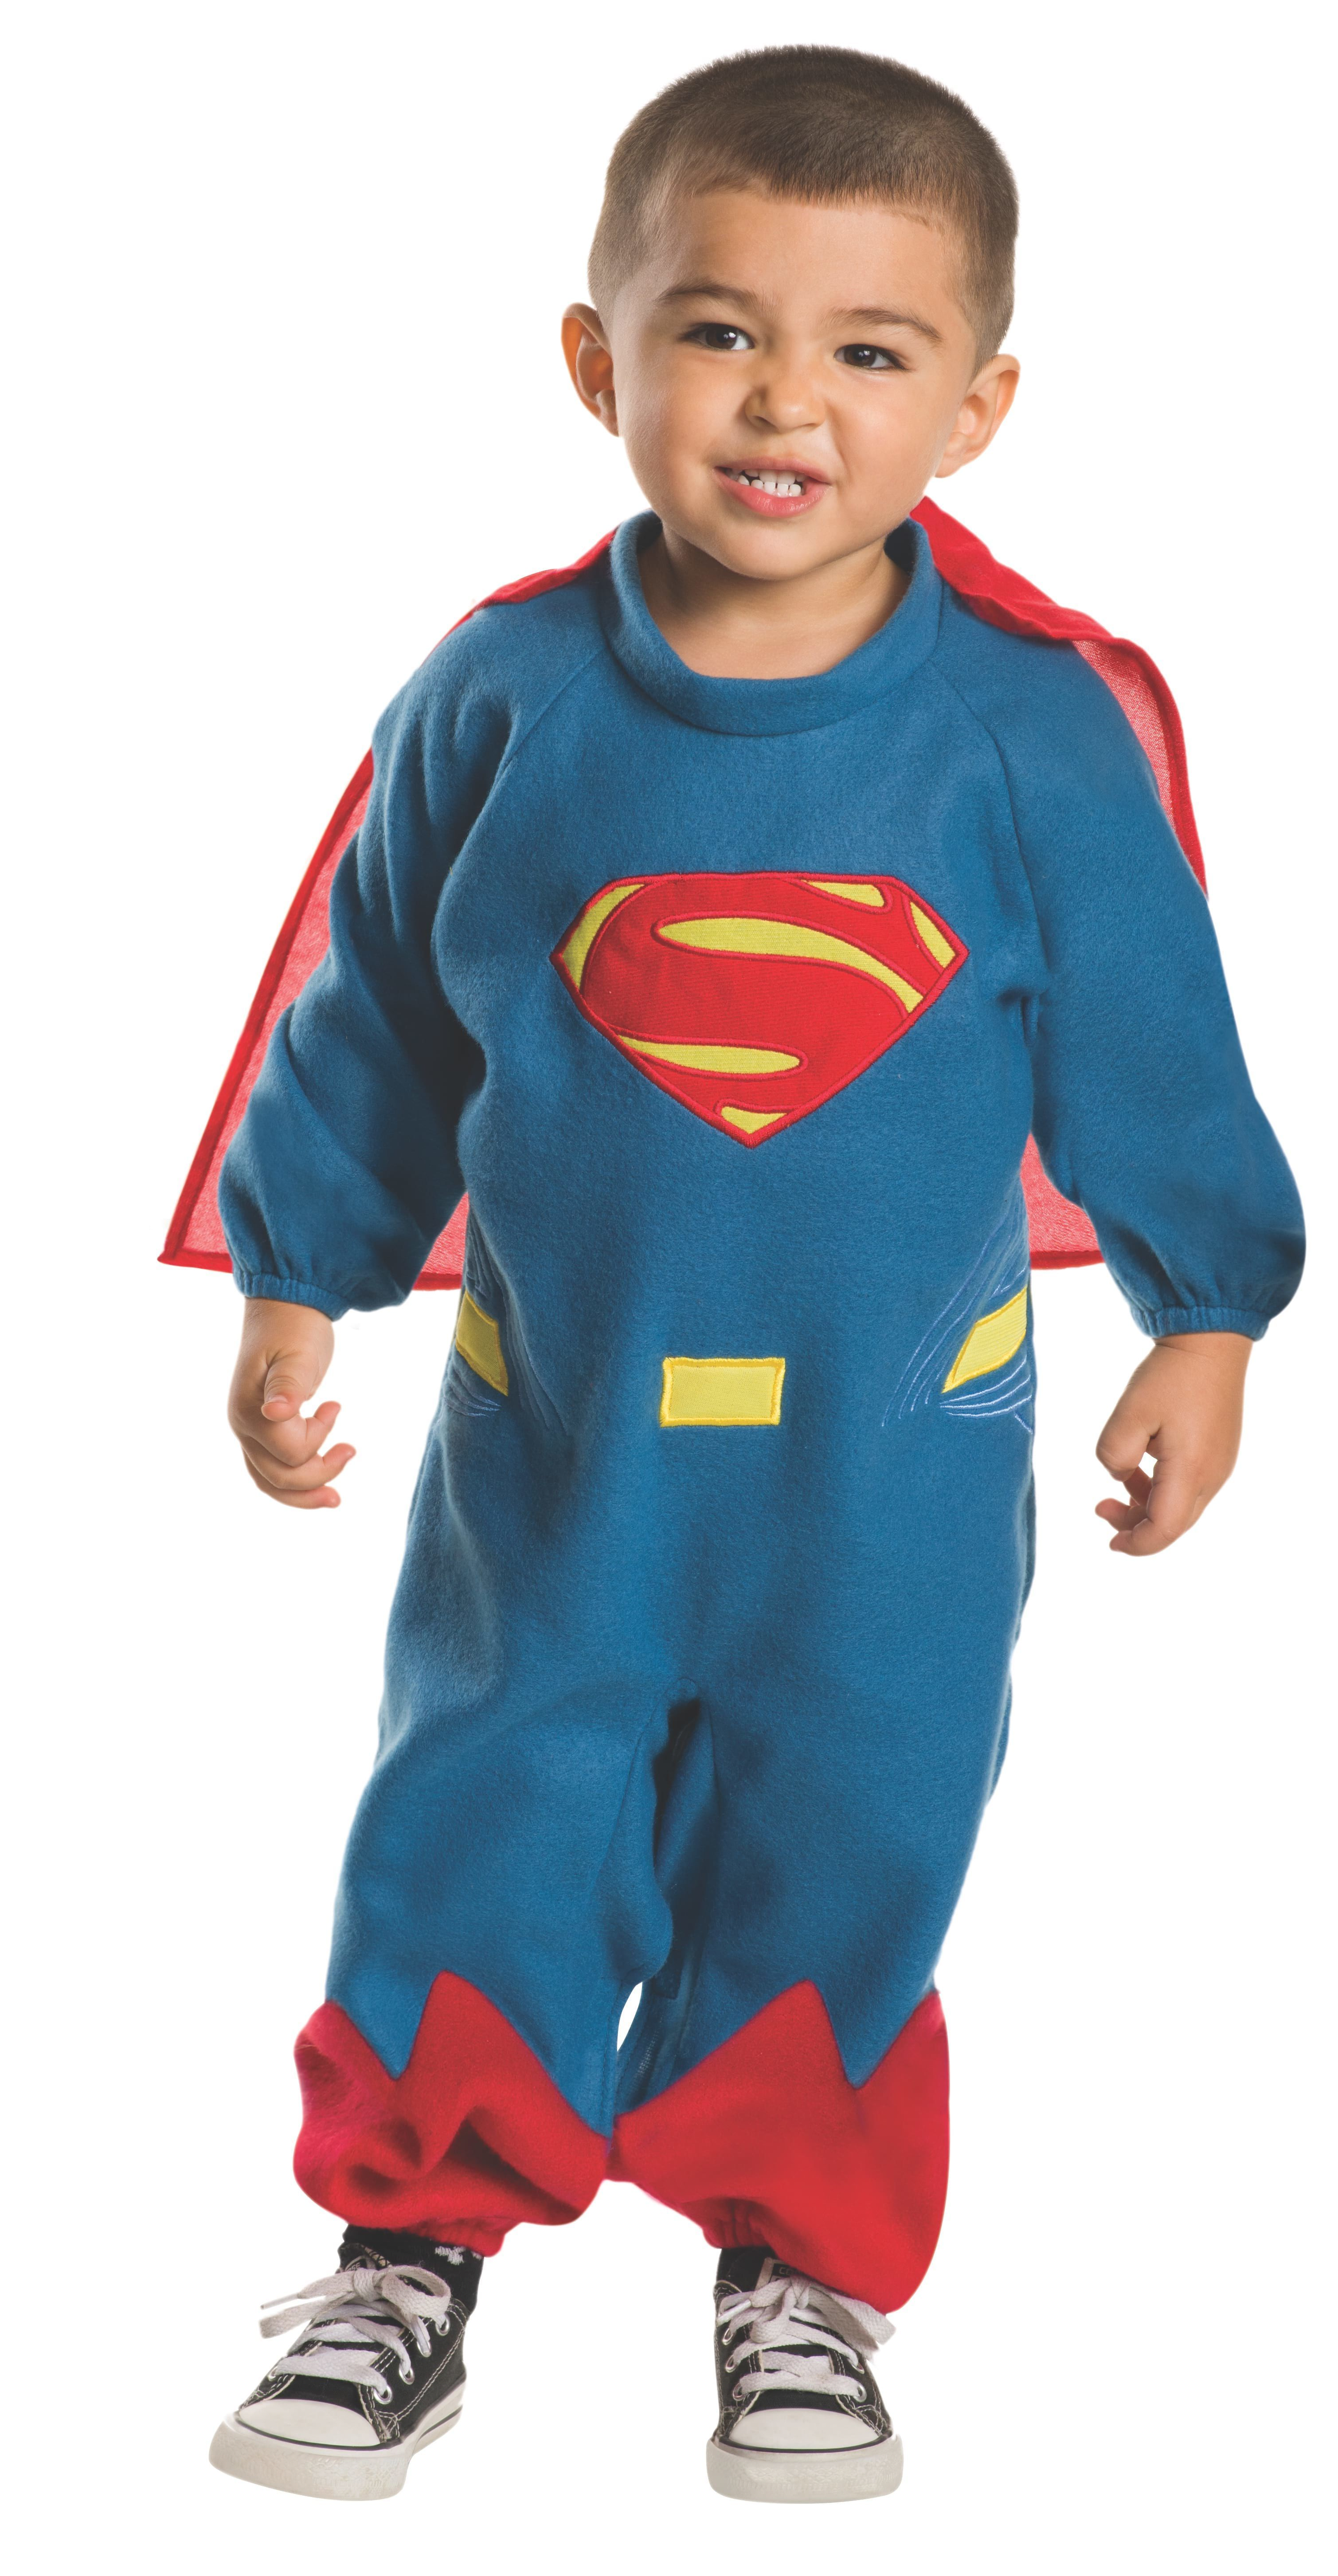 Toddler Superman Costume - DC Comics  f82657acf6